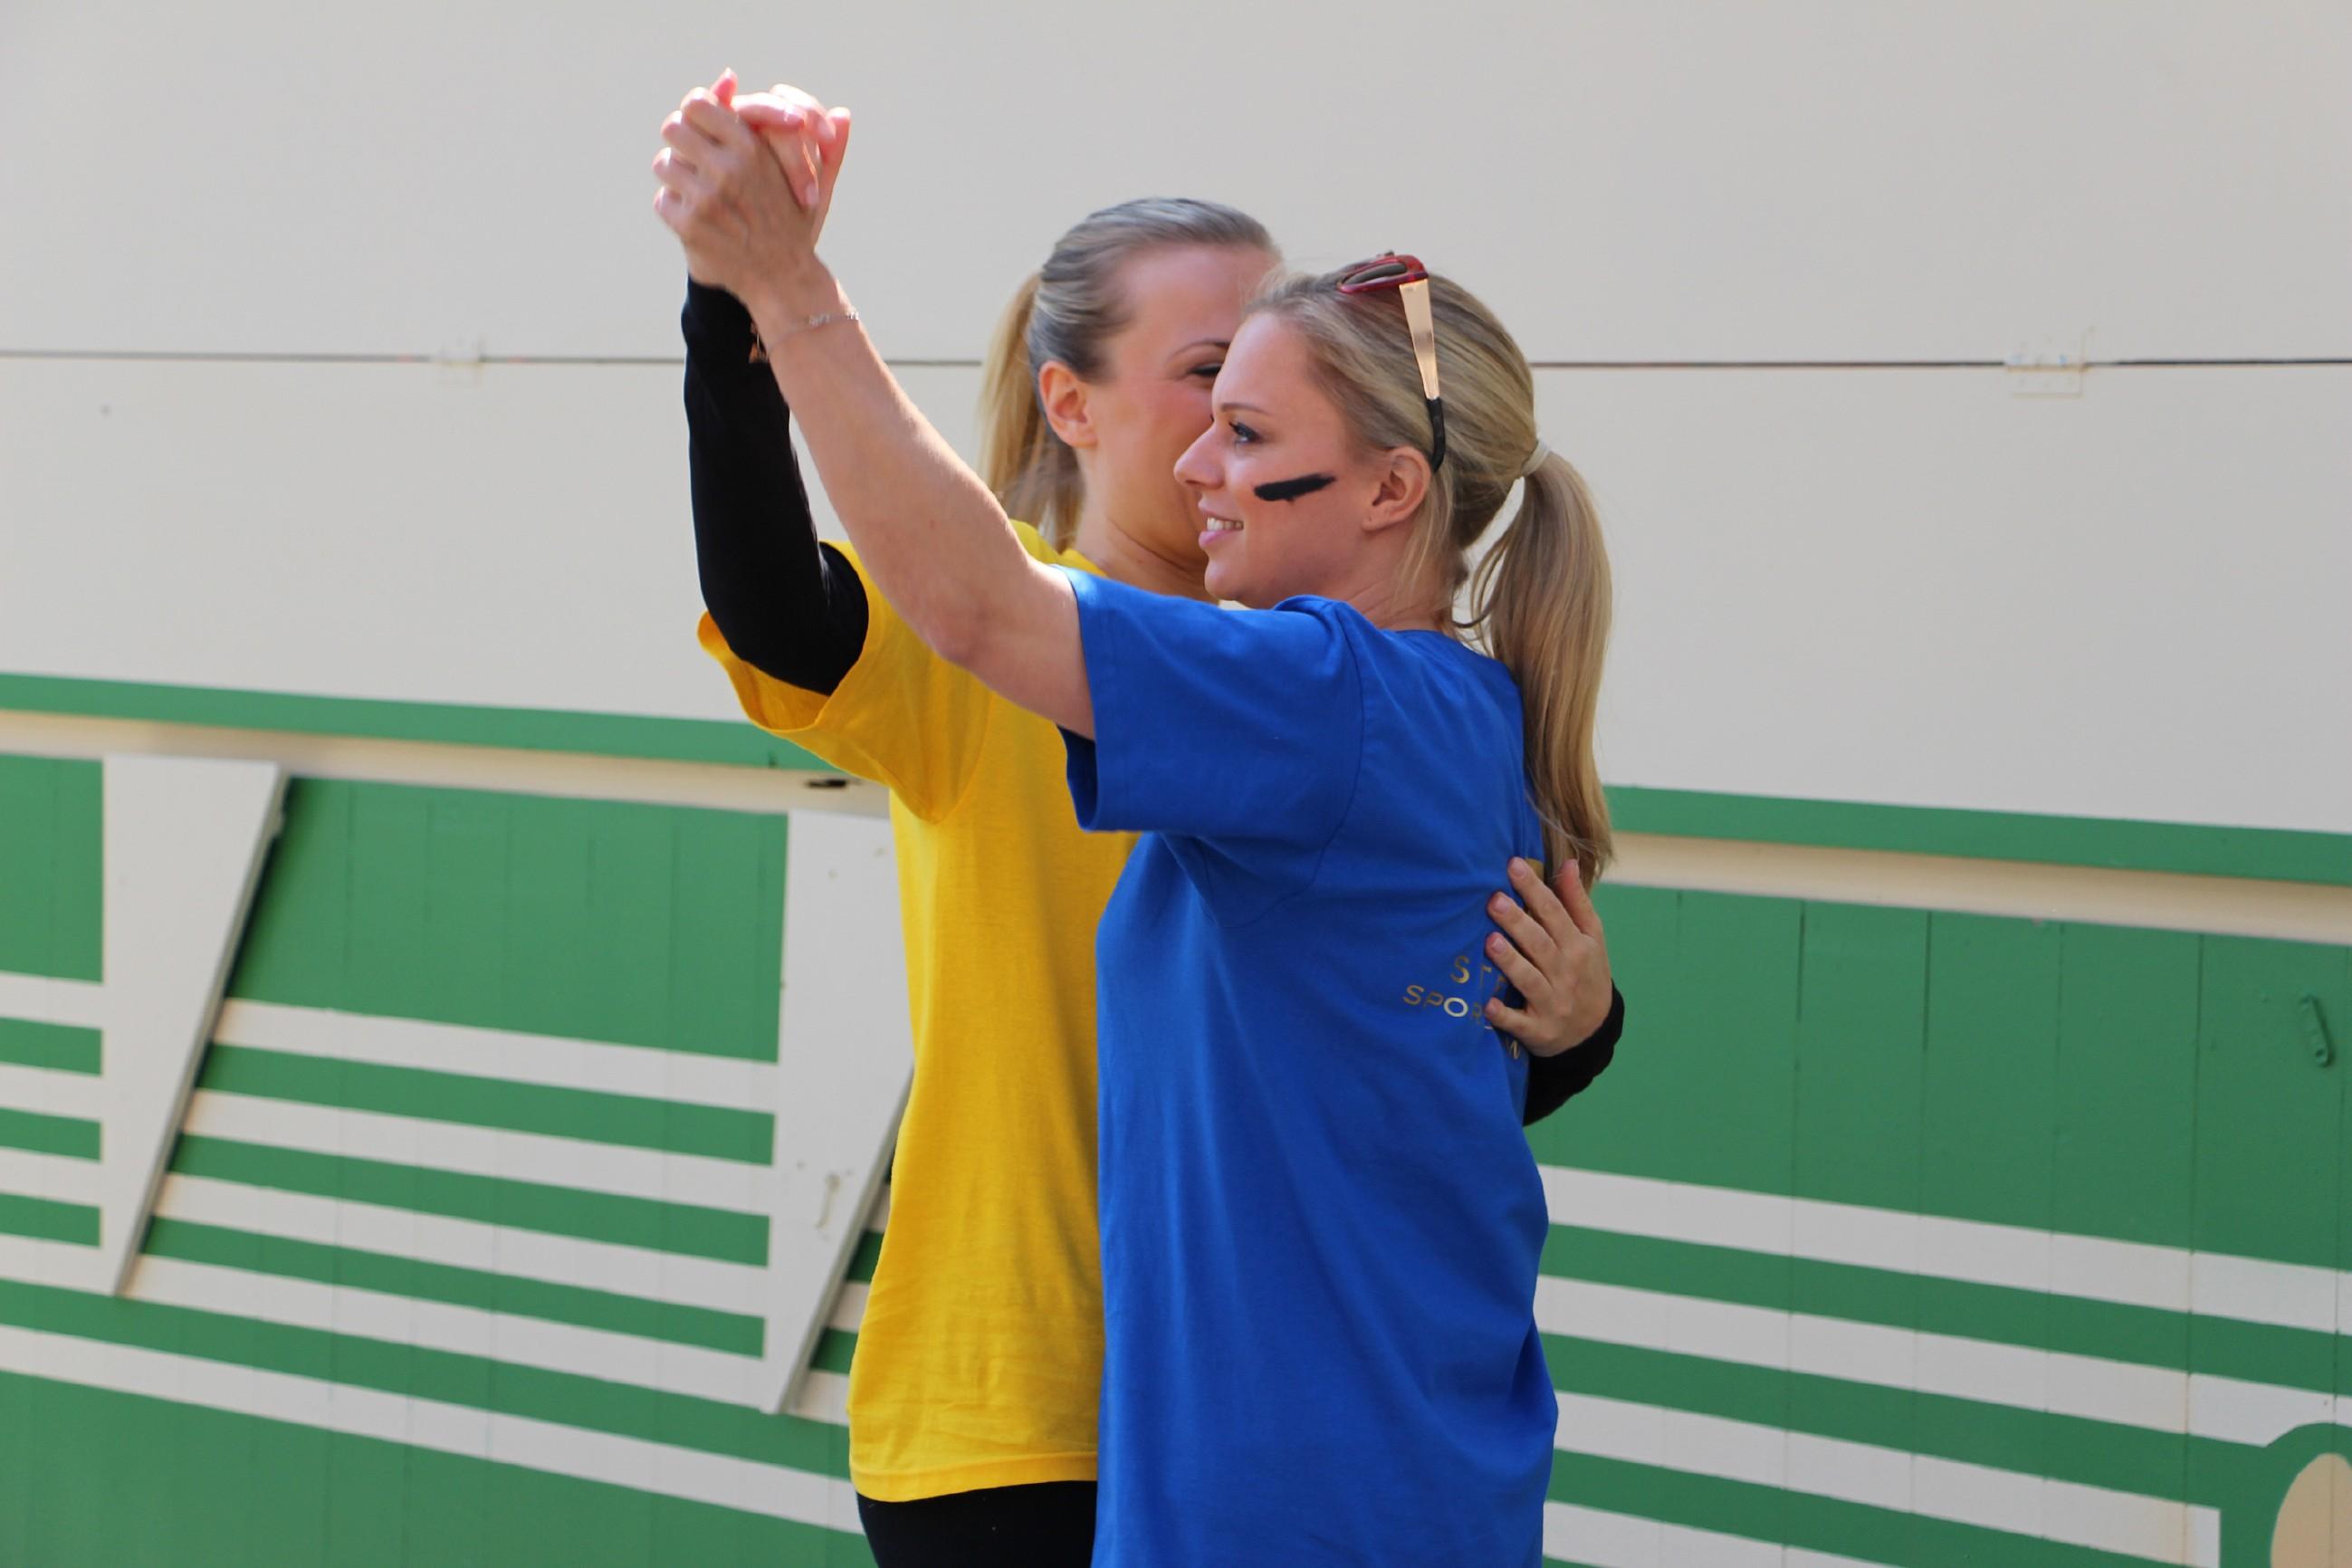 Ania Niedieck (l.) und Juliette Greco